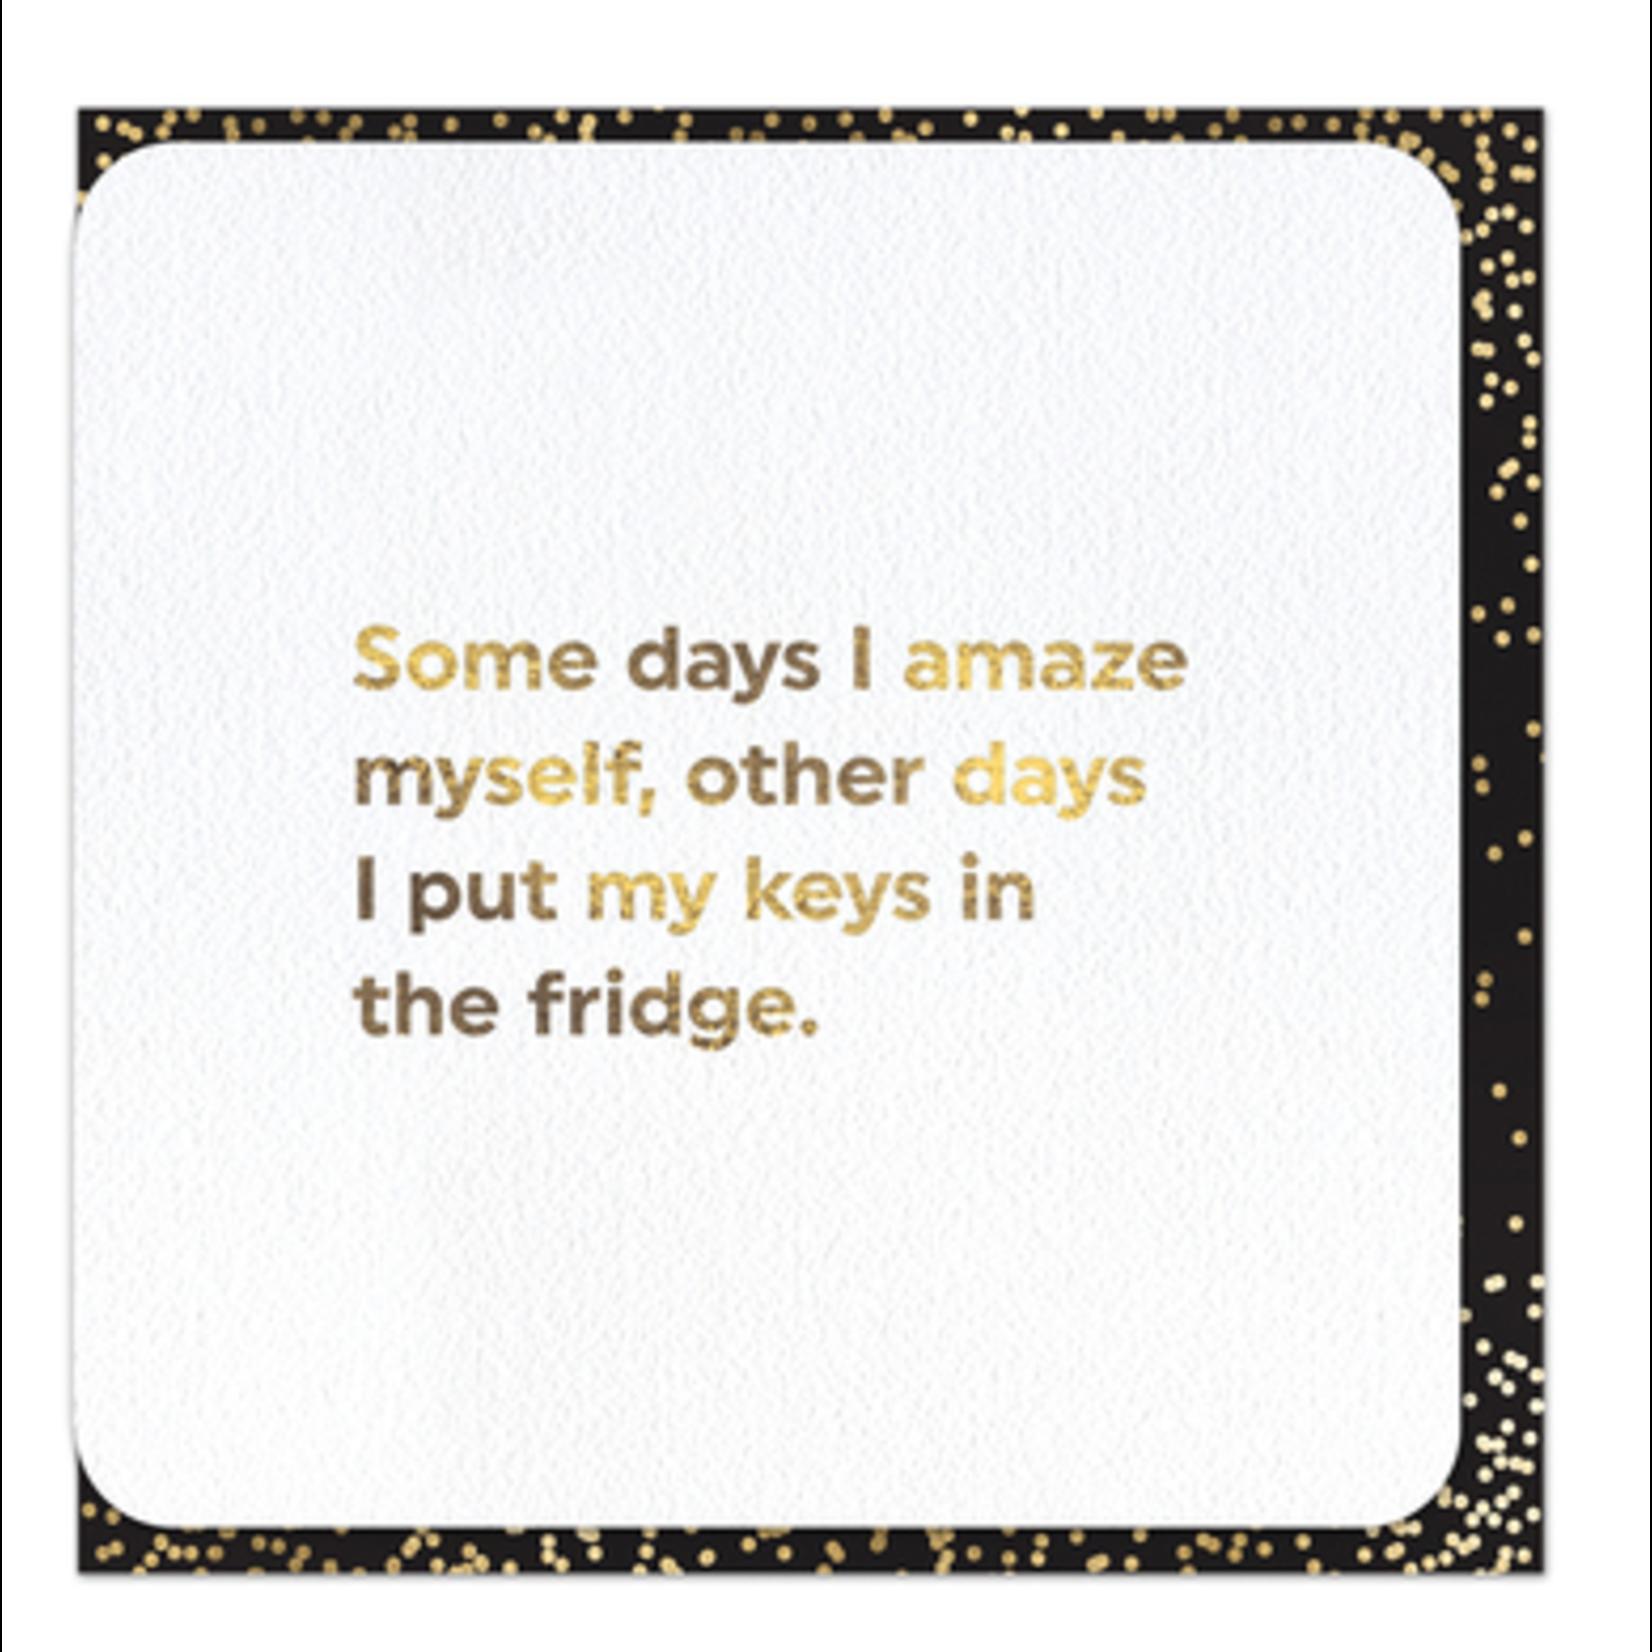 Brainbox Candy Amaze Myself card